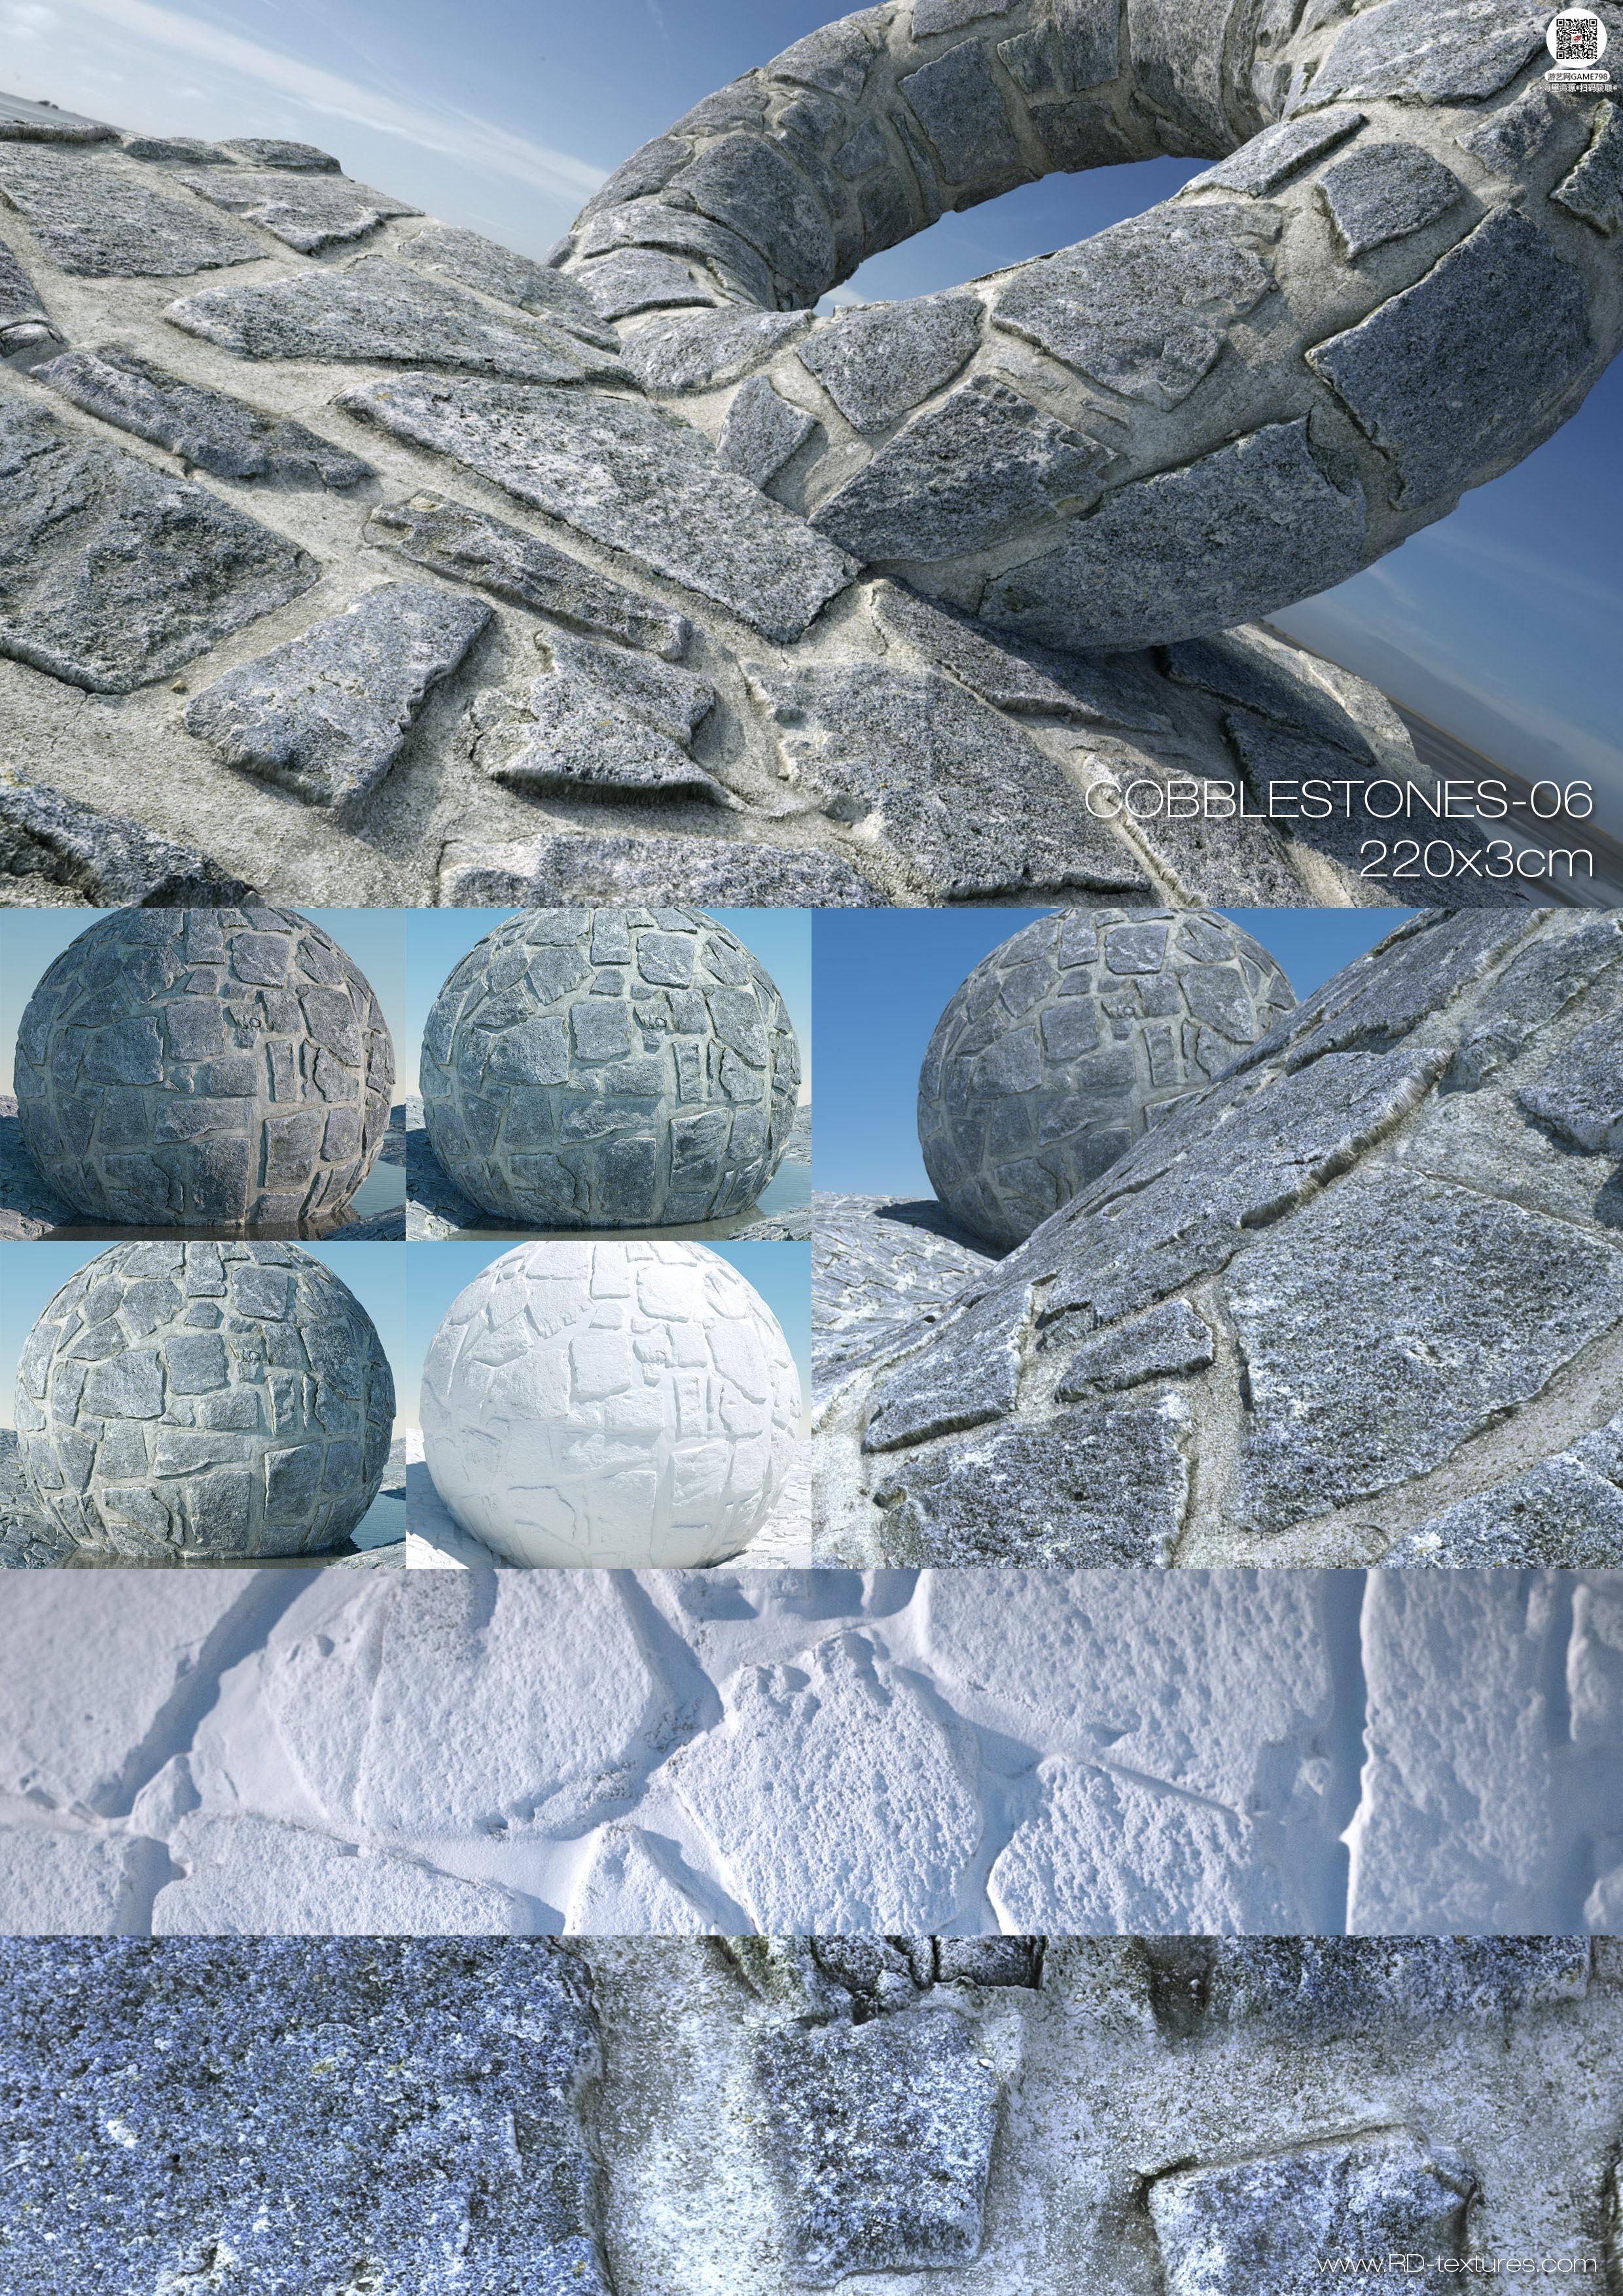 COBBLESTONES-06_220x3cm.jpg